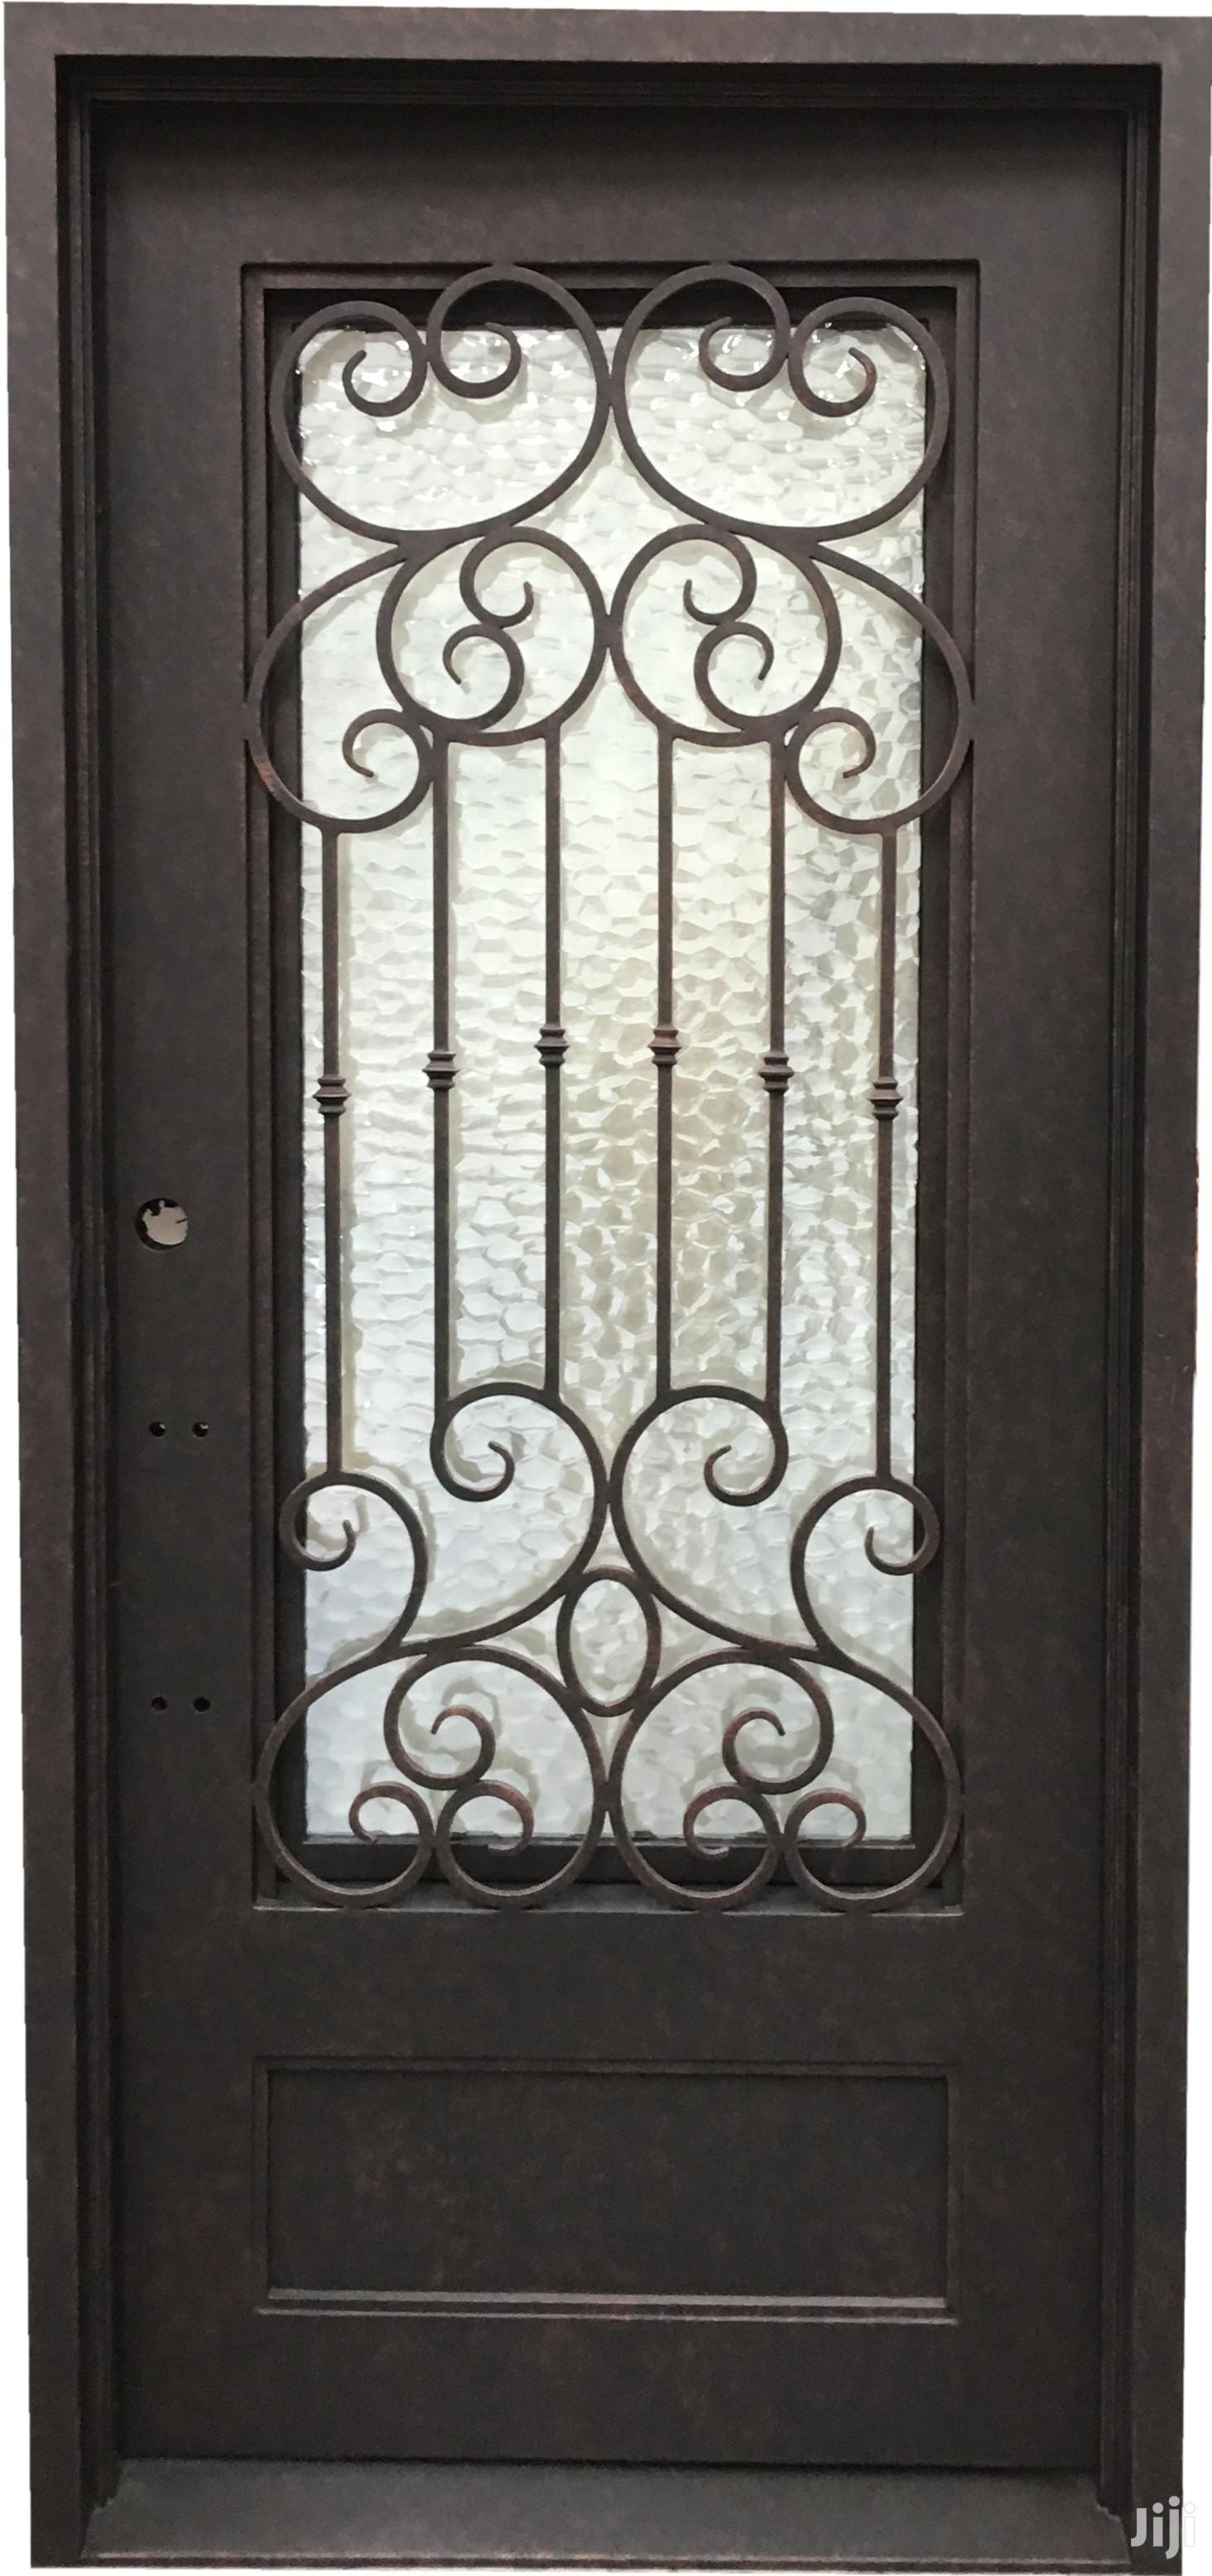 S160819 Wrought Iron Doors F | Doors for sale in Kampala, Central Region, Uganda